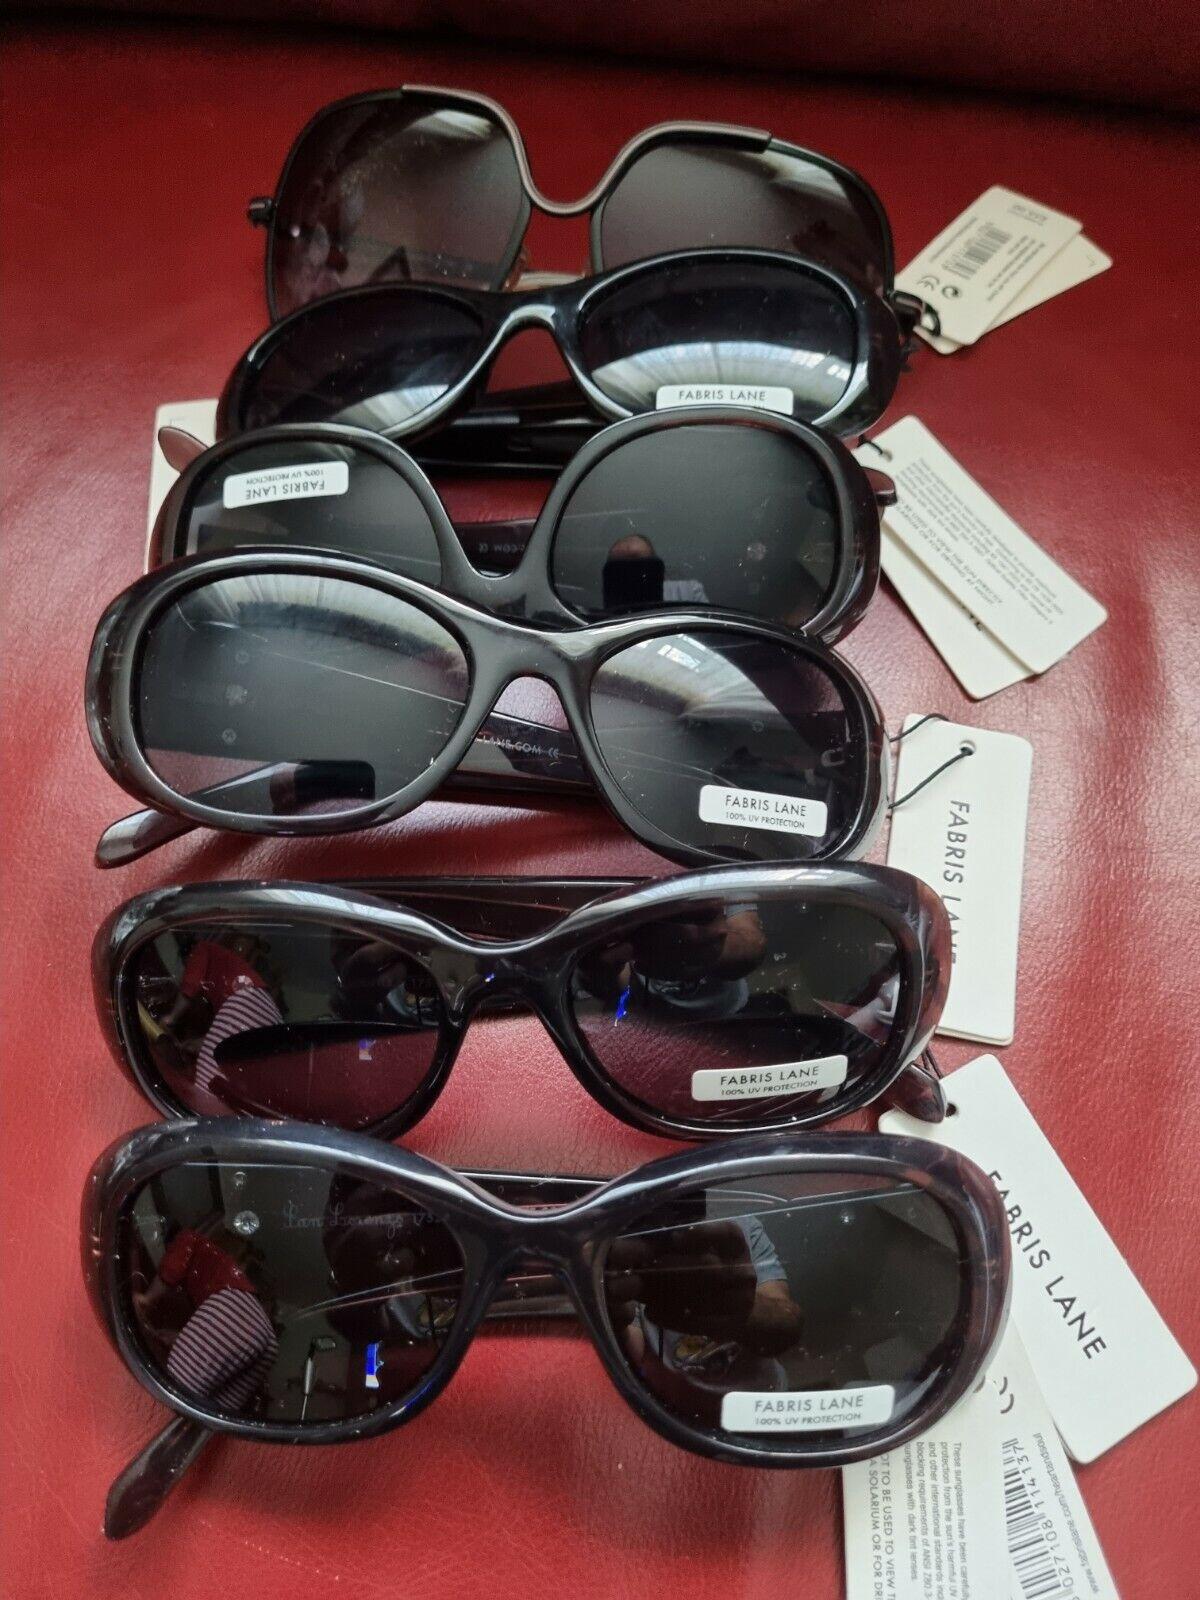 Fabris Lane Women Sunglasses lot. New.